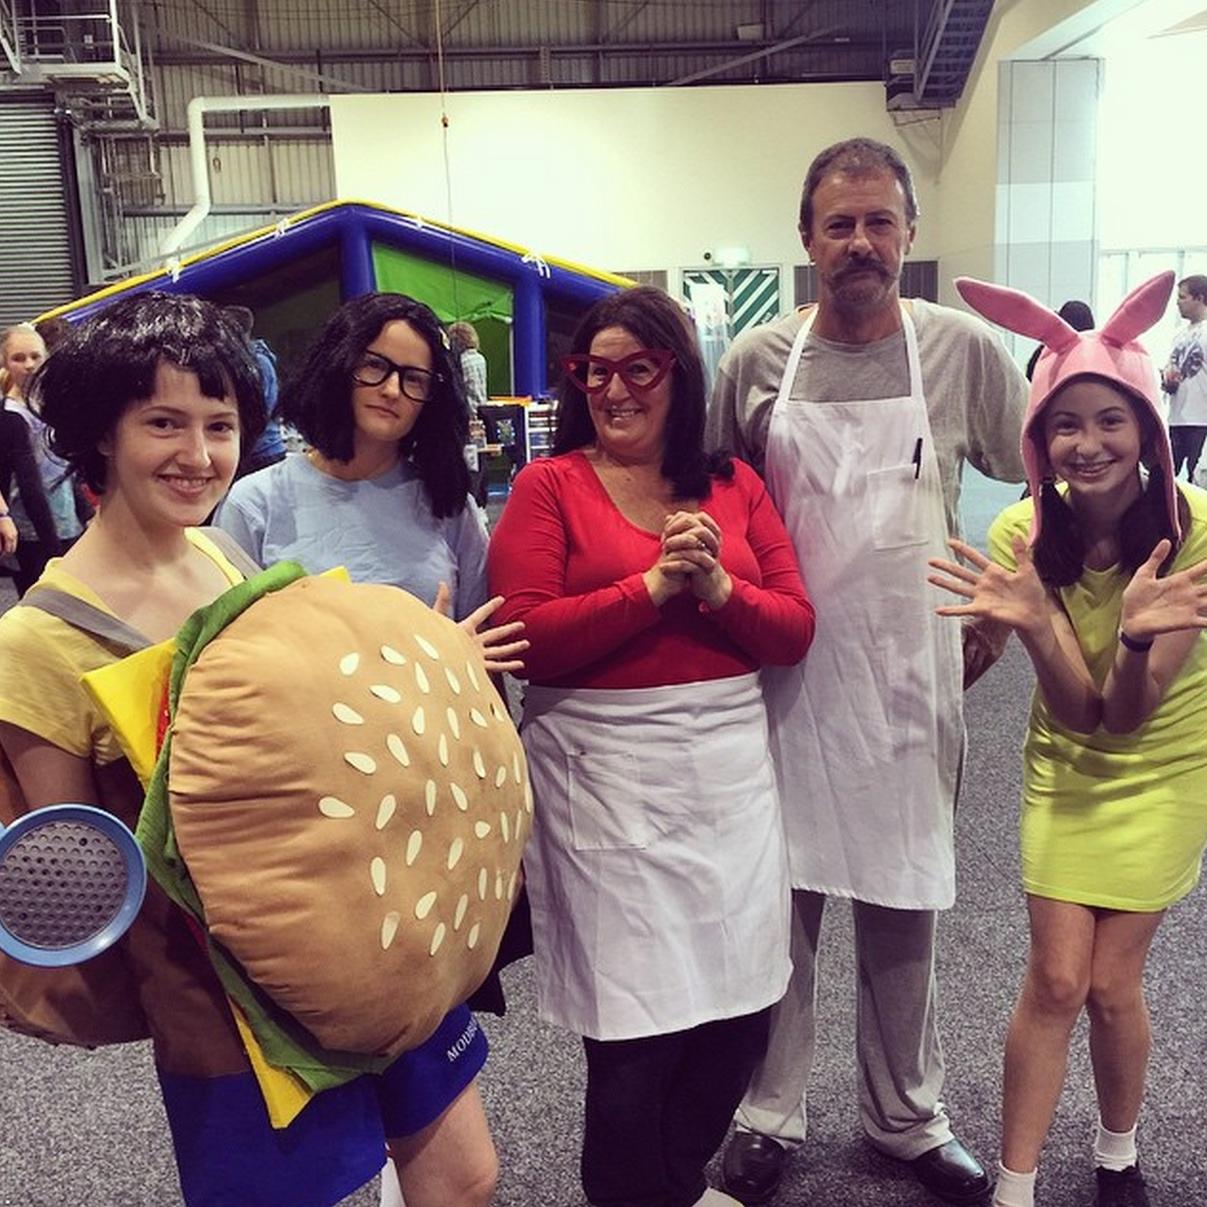 Bobs Burgers family on fleek!via @ozcomiccon Instagram.